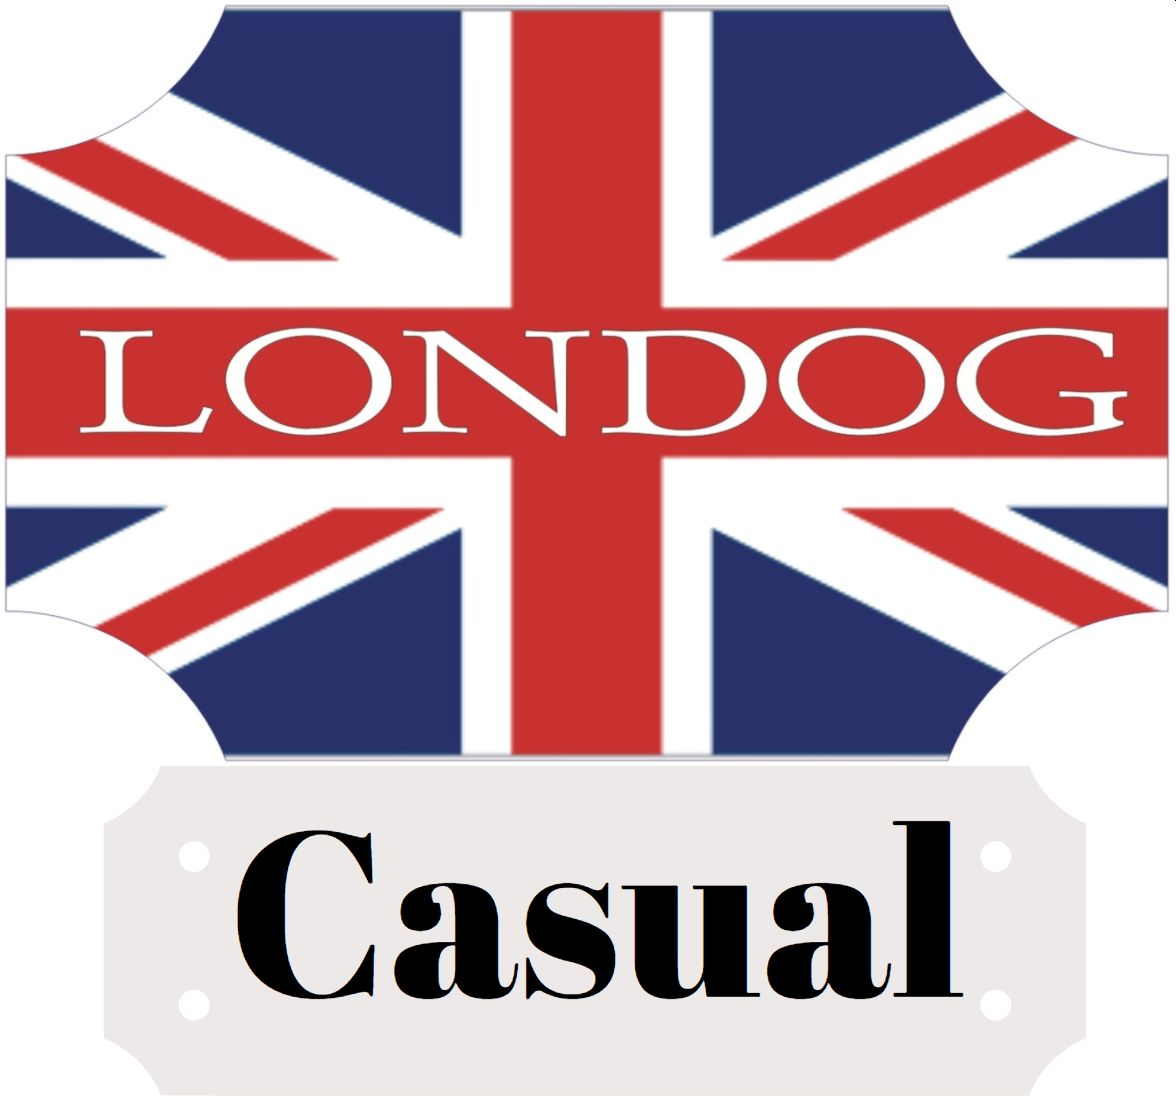 Londog Causal